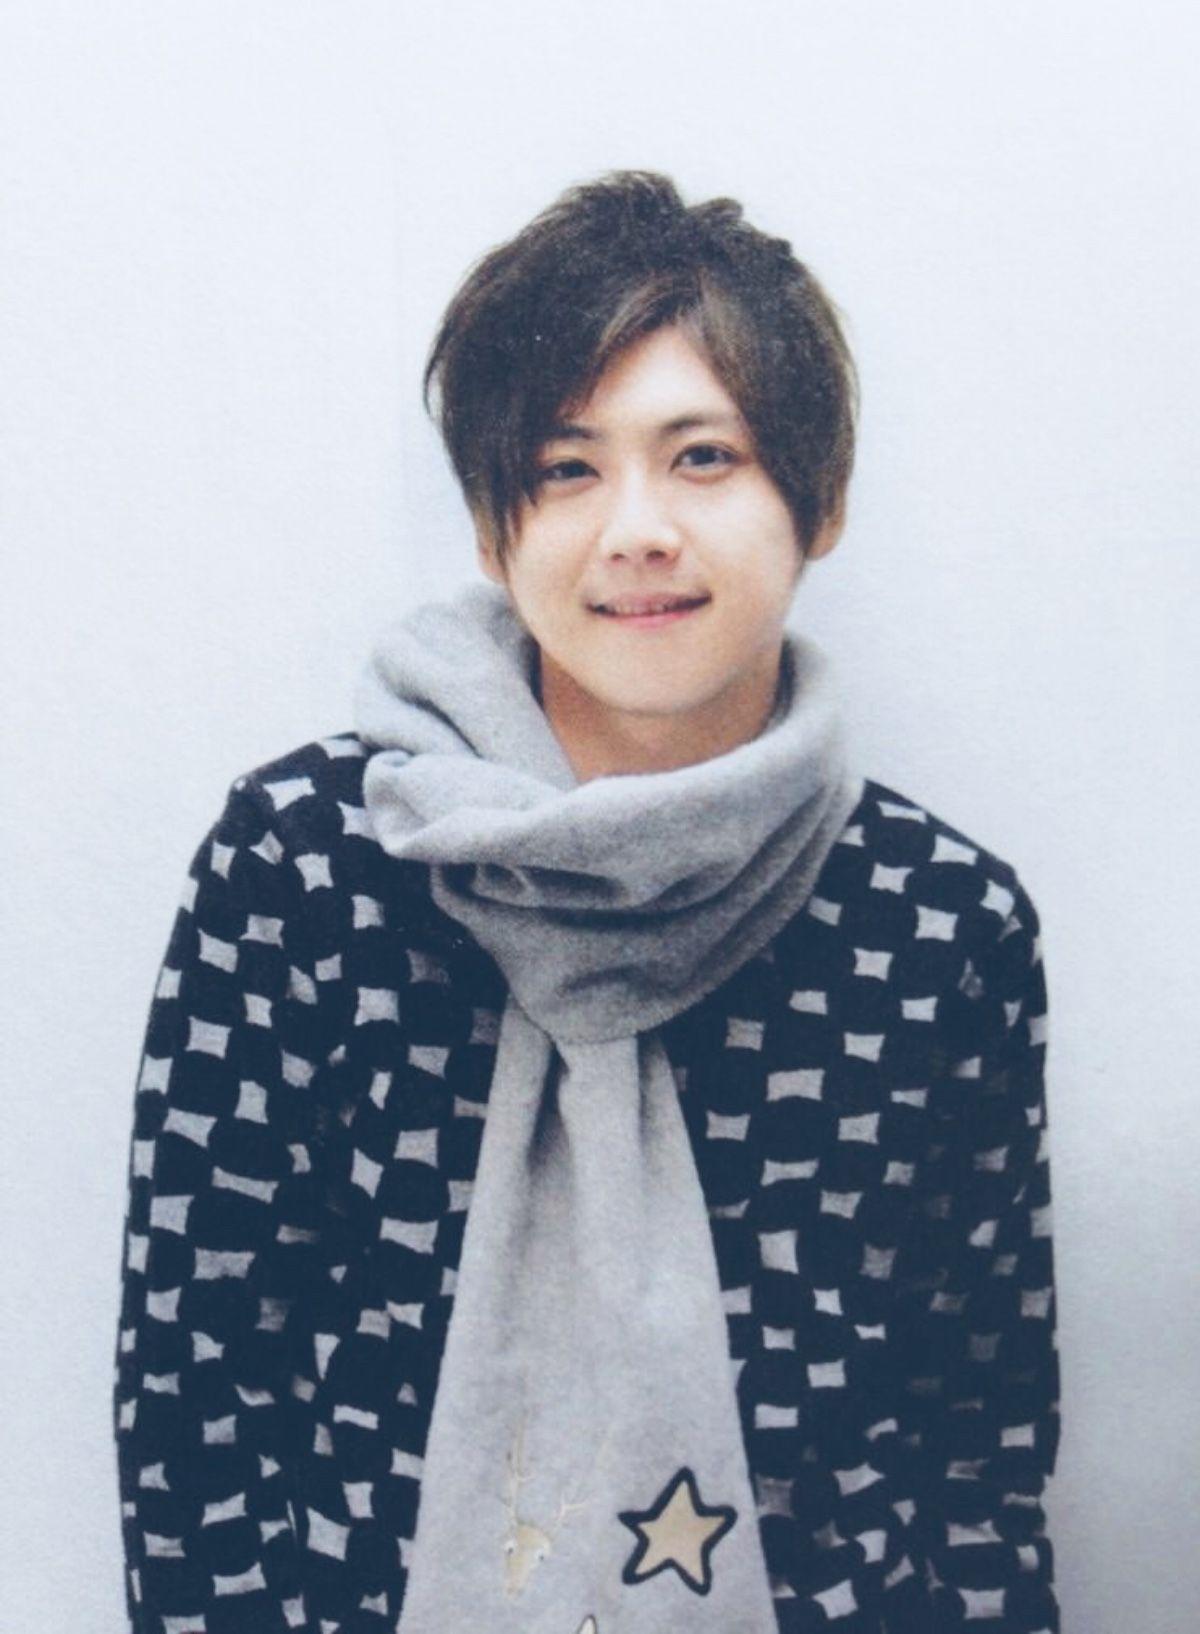 voice actor mainly yuki kaji おしゃれまとめの人気アイデア pinterest lili pailapan 声優 梶裕貴